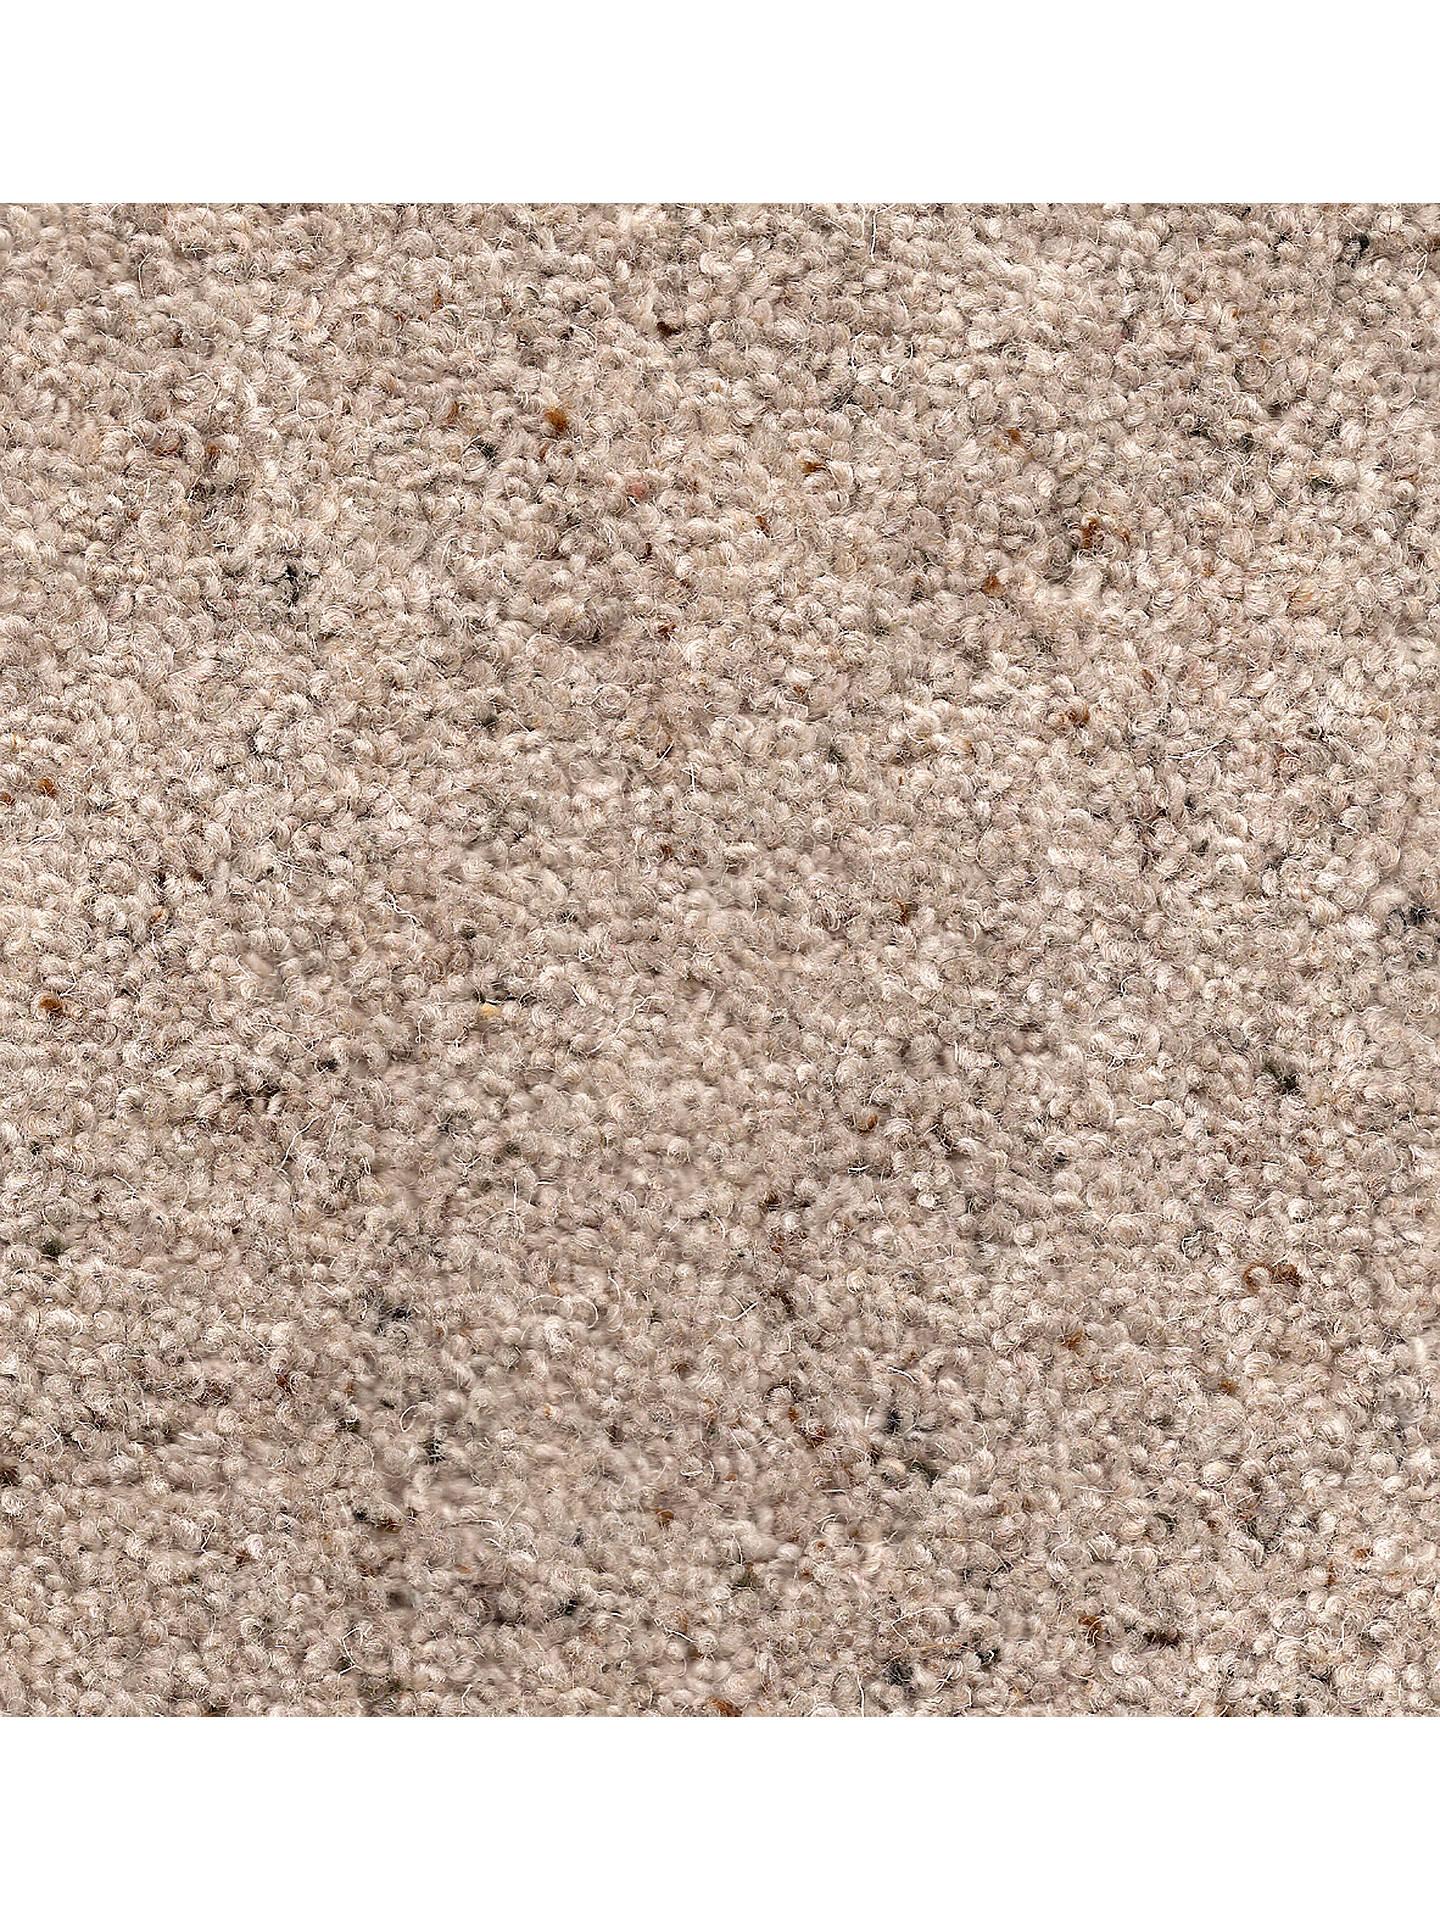 john lewis partners wool rich flecked 55oz twist carpet. Black Bedroom Furniture Sets. Home Design Ideas